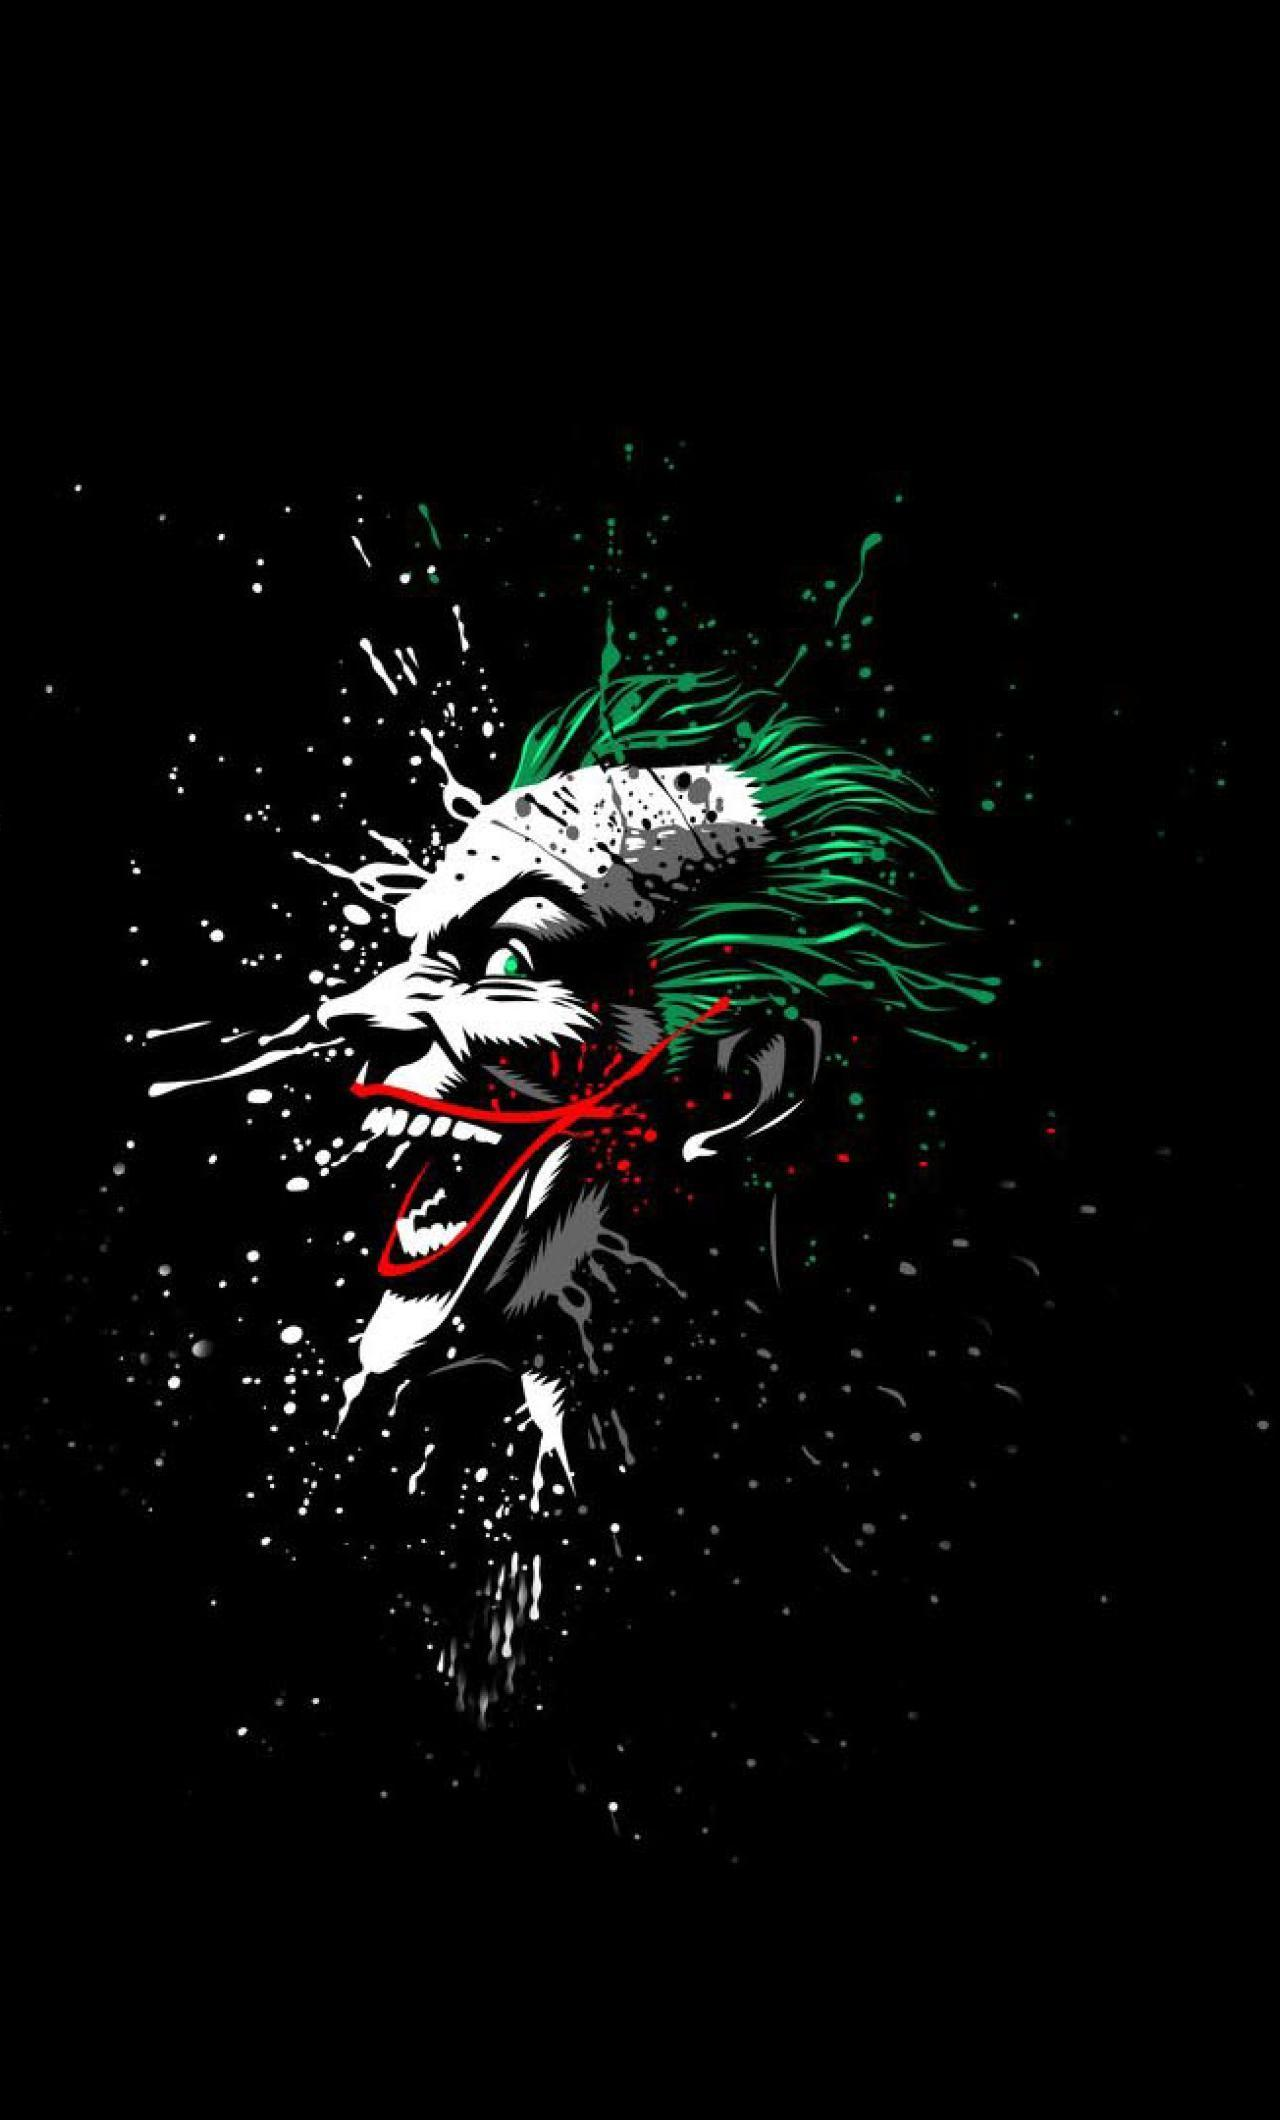 Joker 2020 Wallpapers Wallpaper Cave